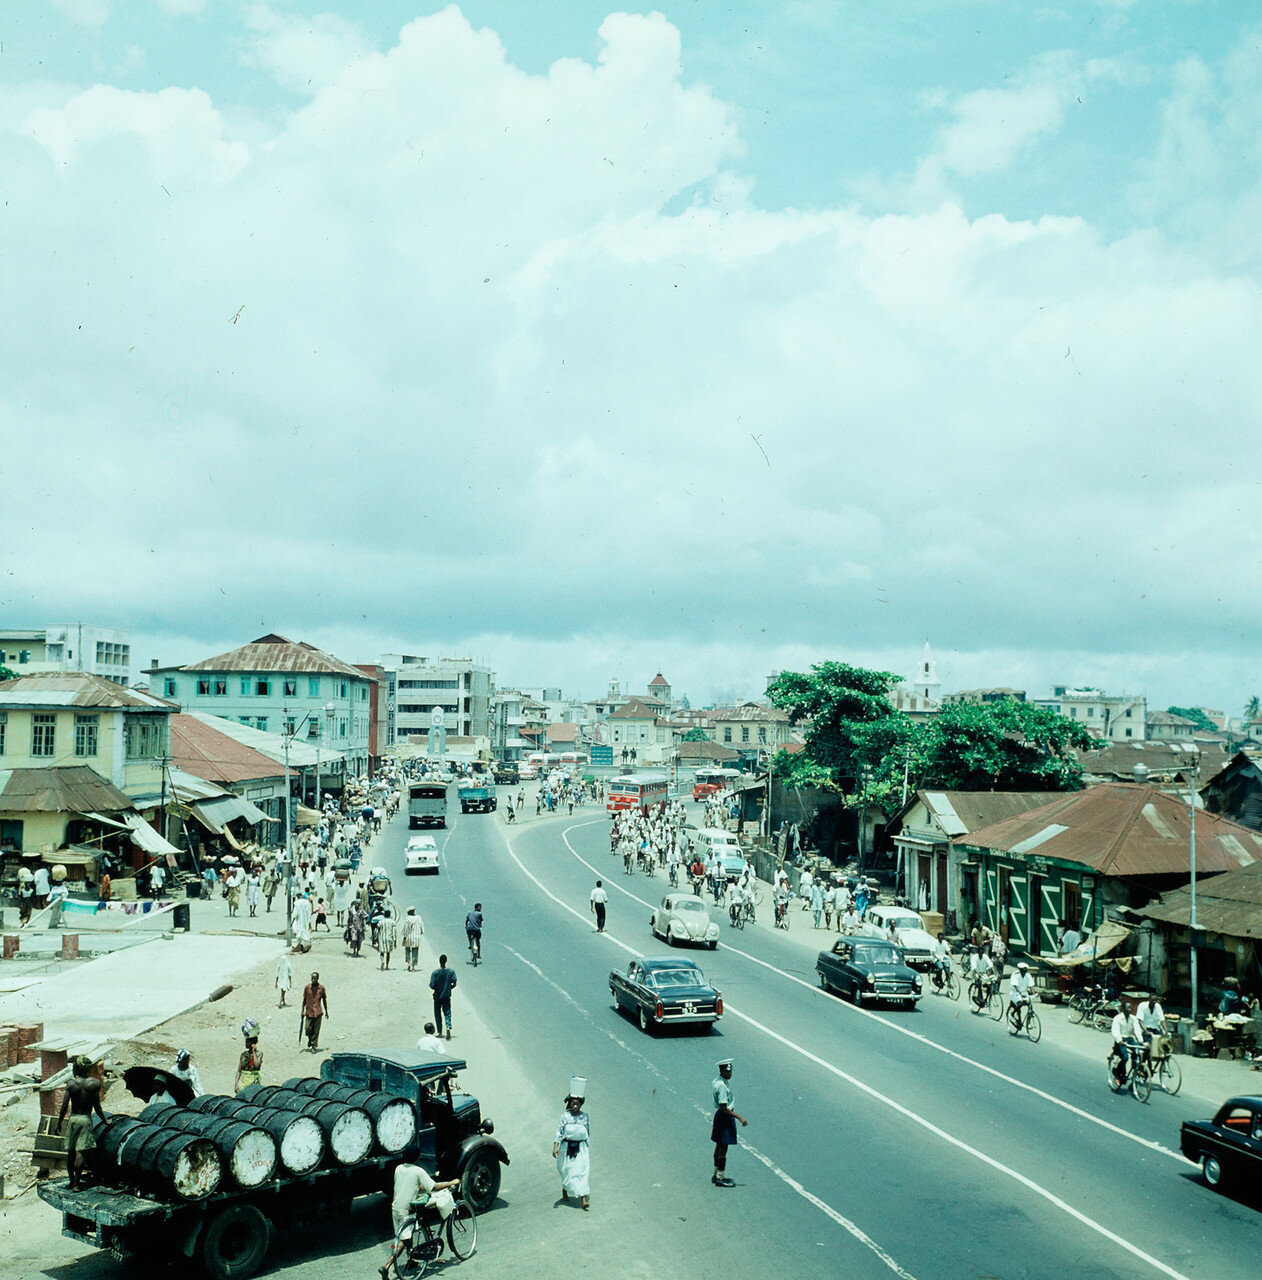 Лагос, Нигерия. Уличная сцена